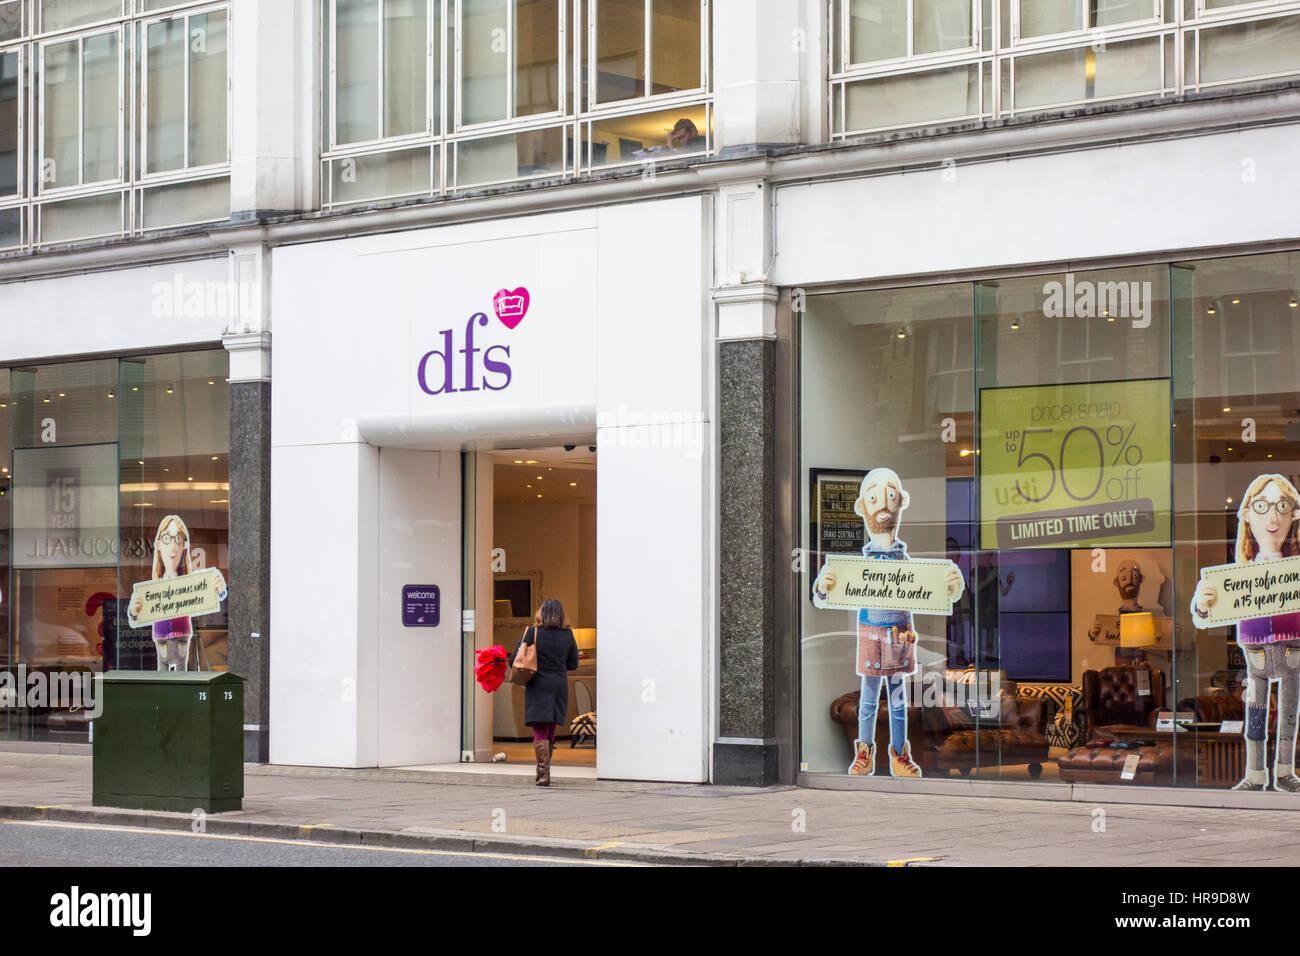 dfs shop store tottenham court road london uk stock photo